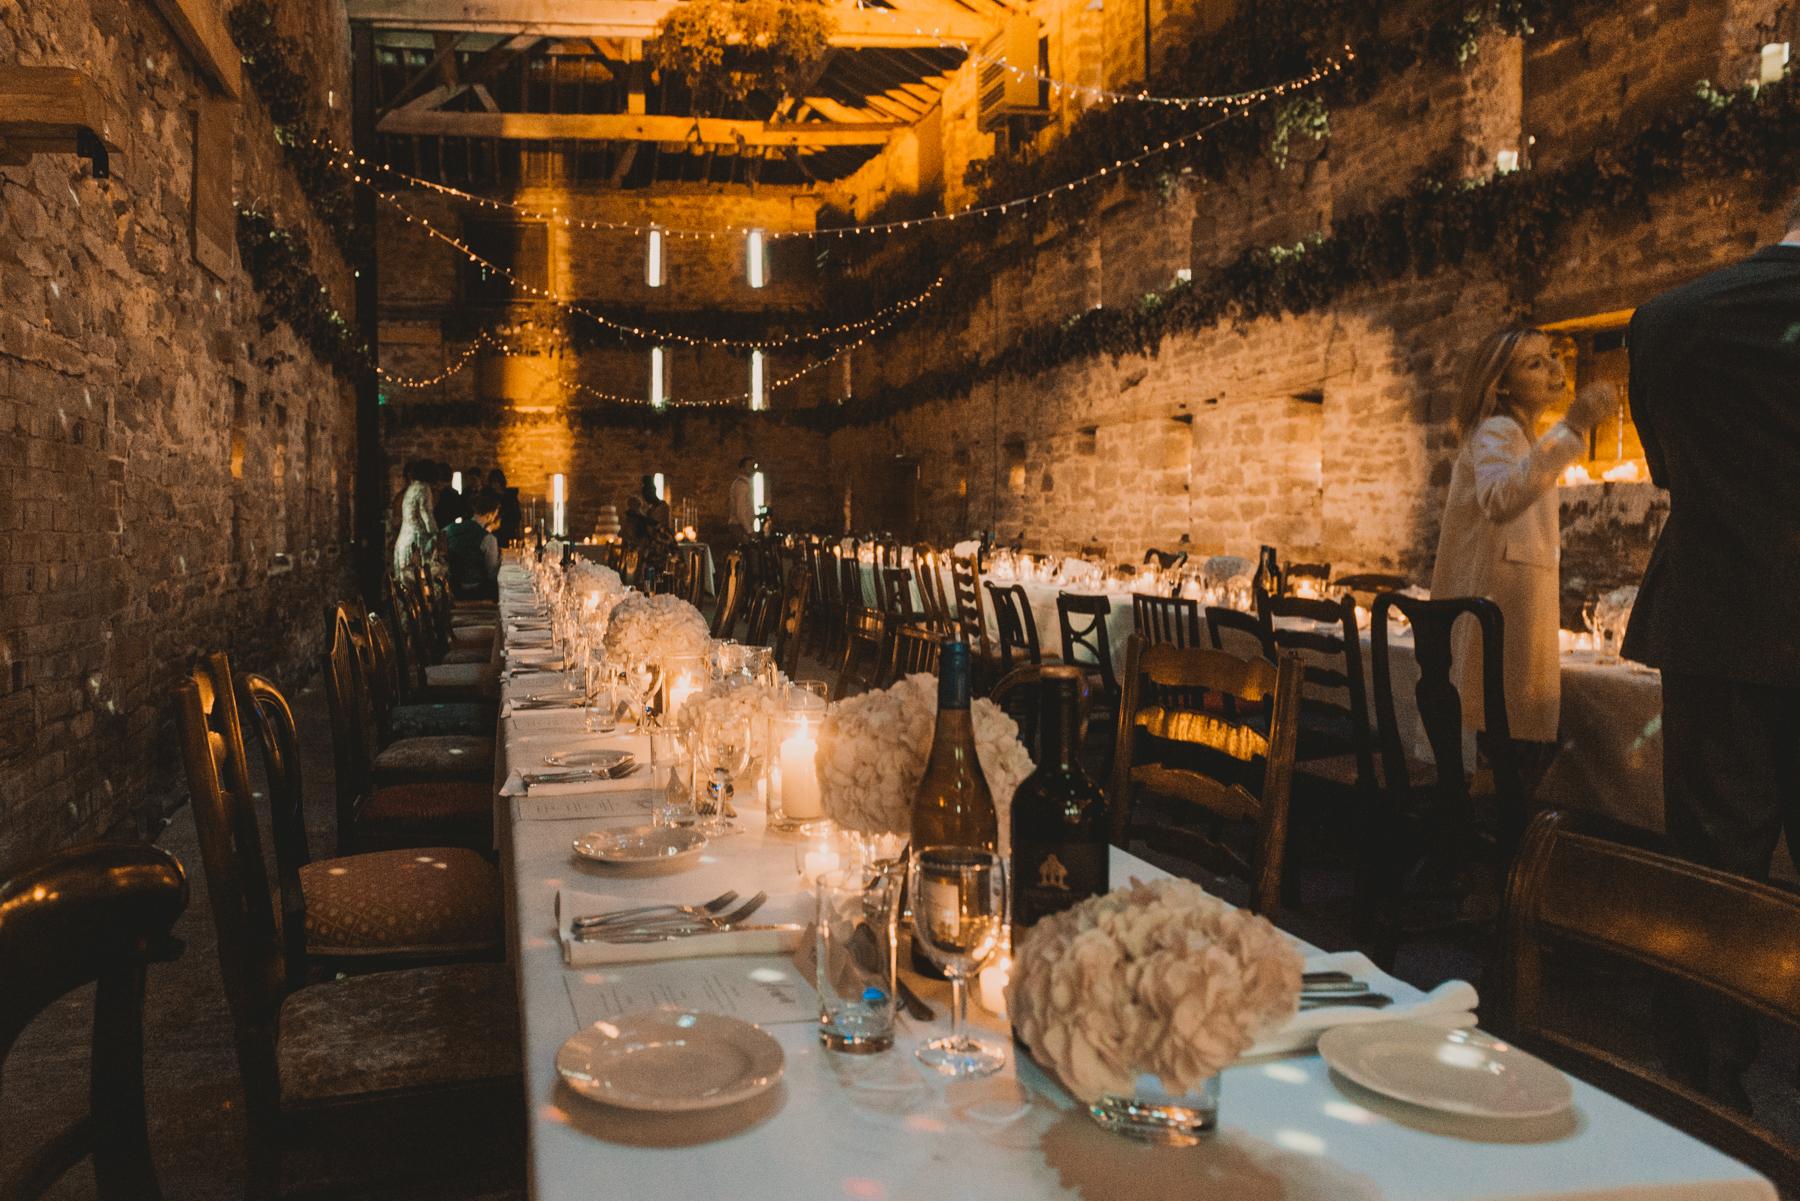 Herefordshire-barn-wedding-highlights-106.jpg